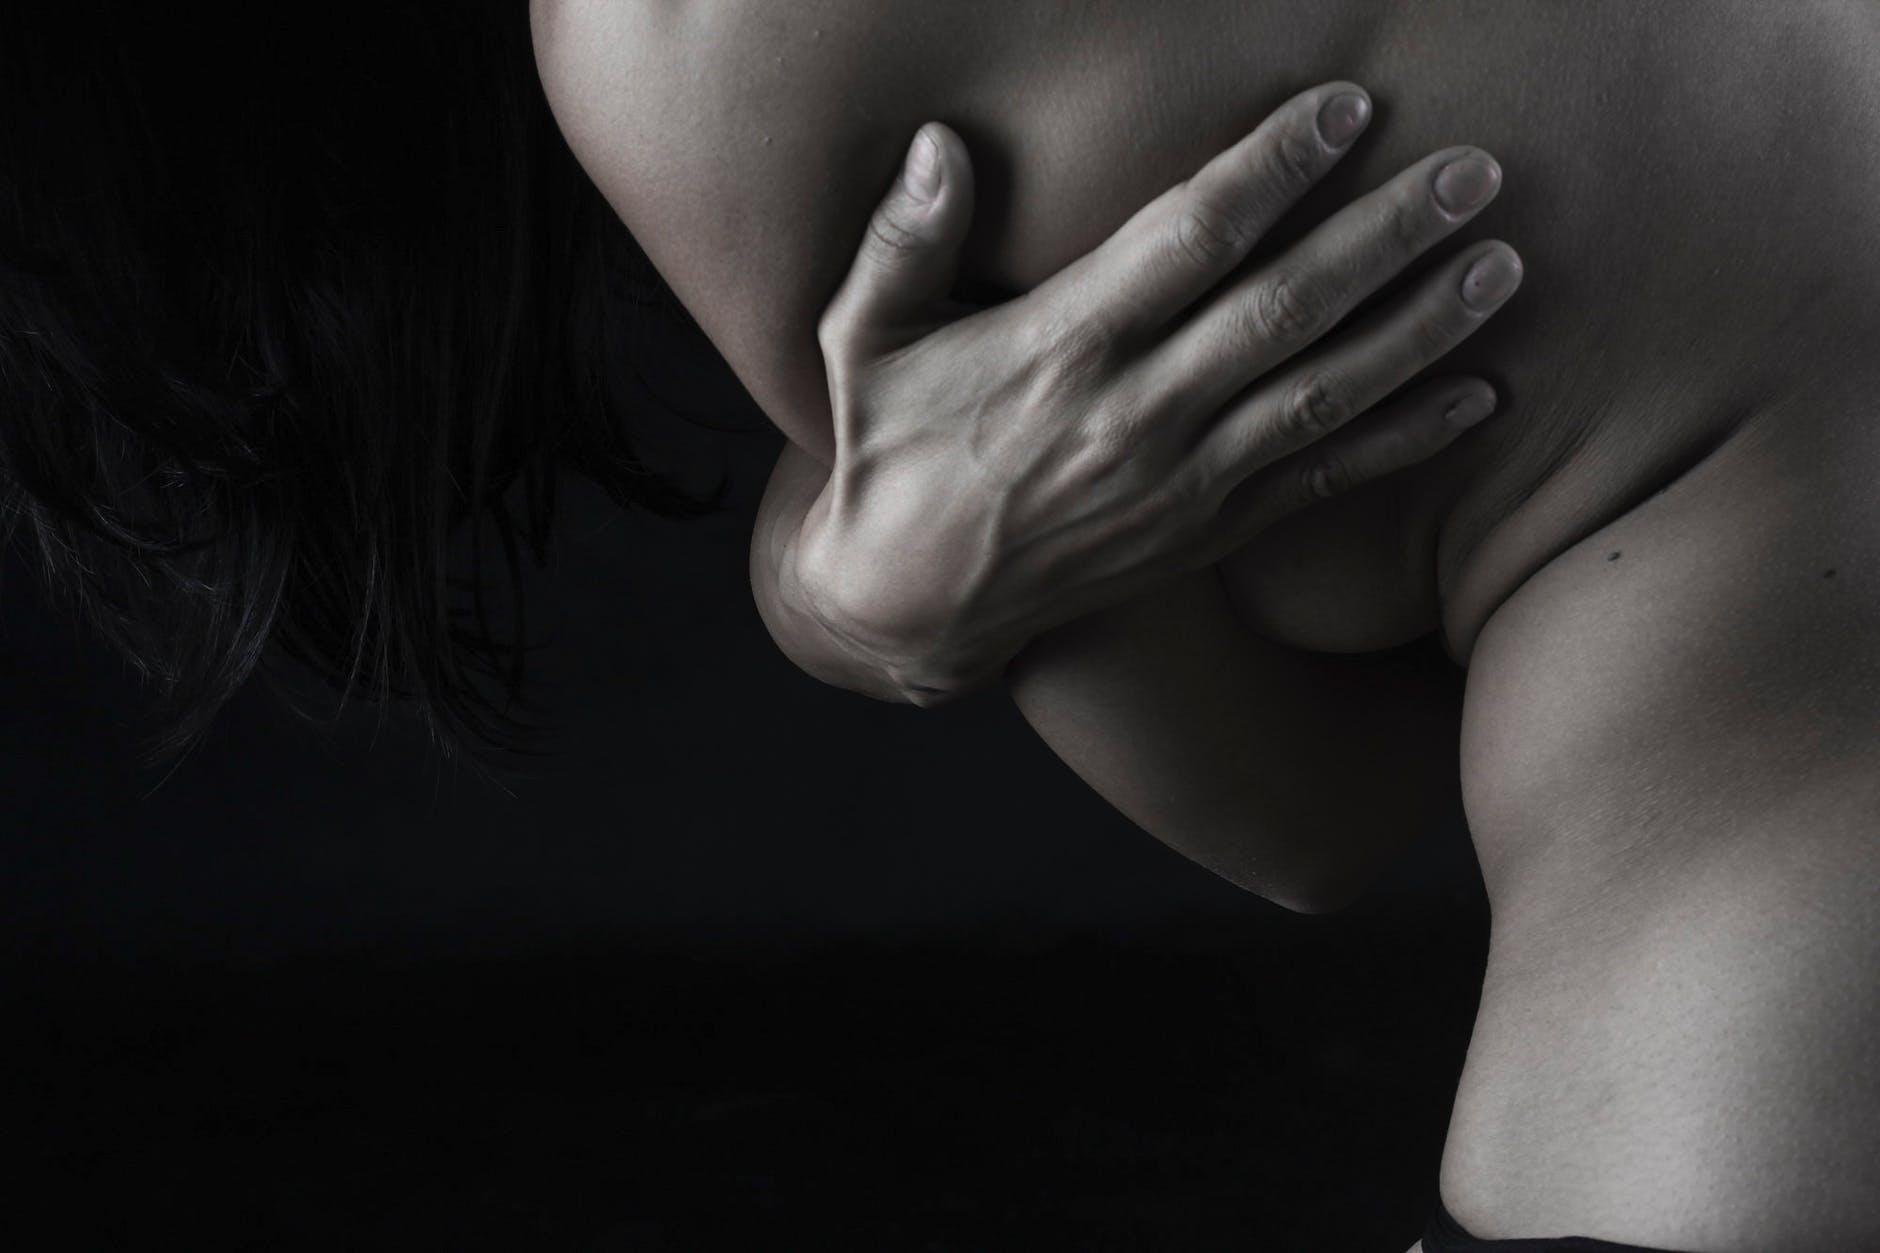 telo, ruka